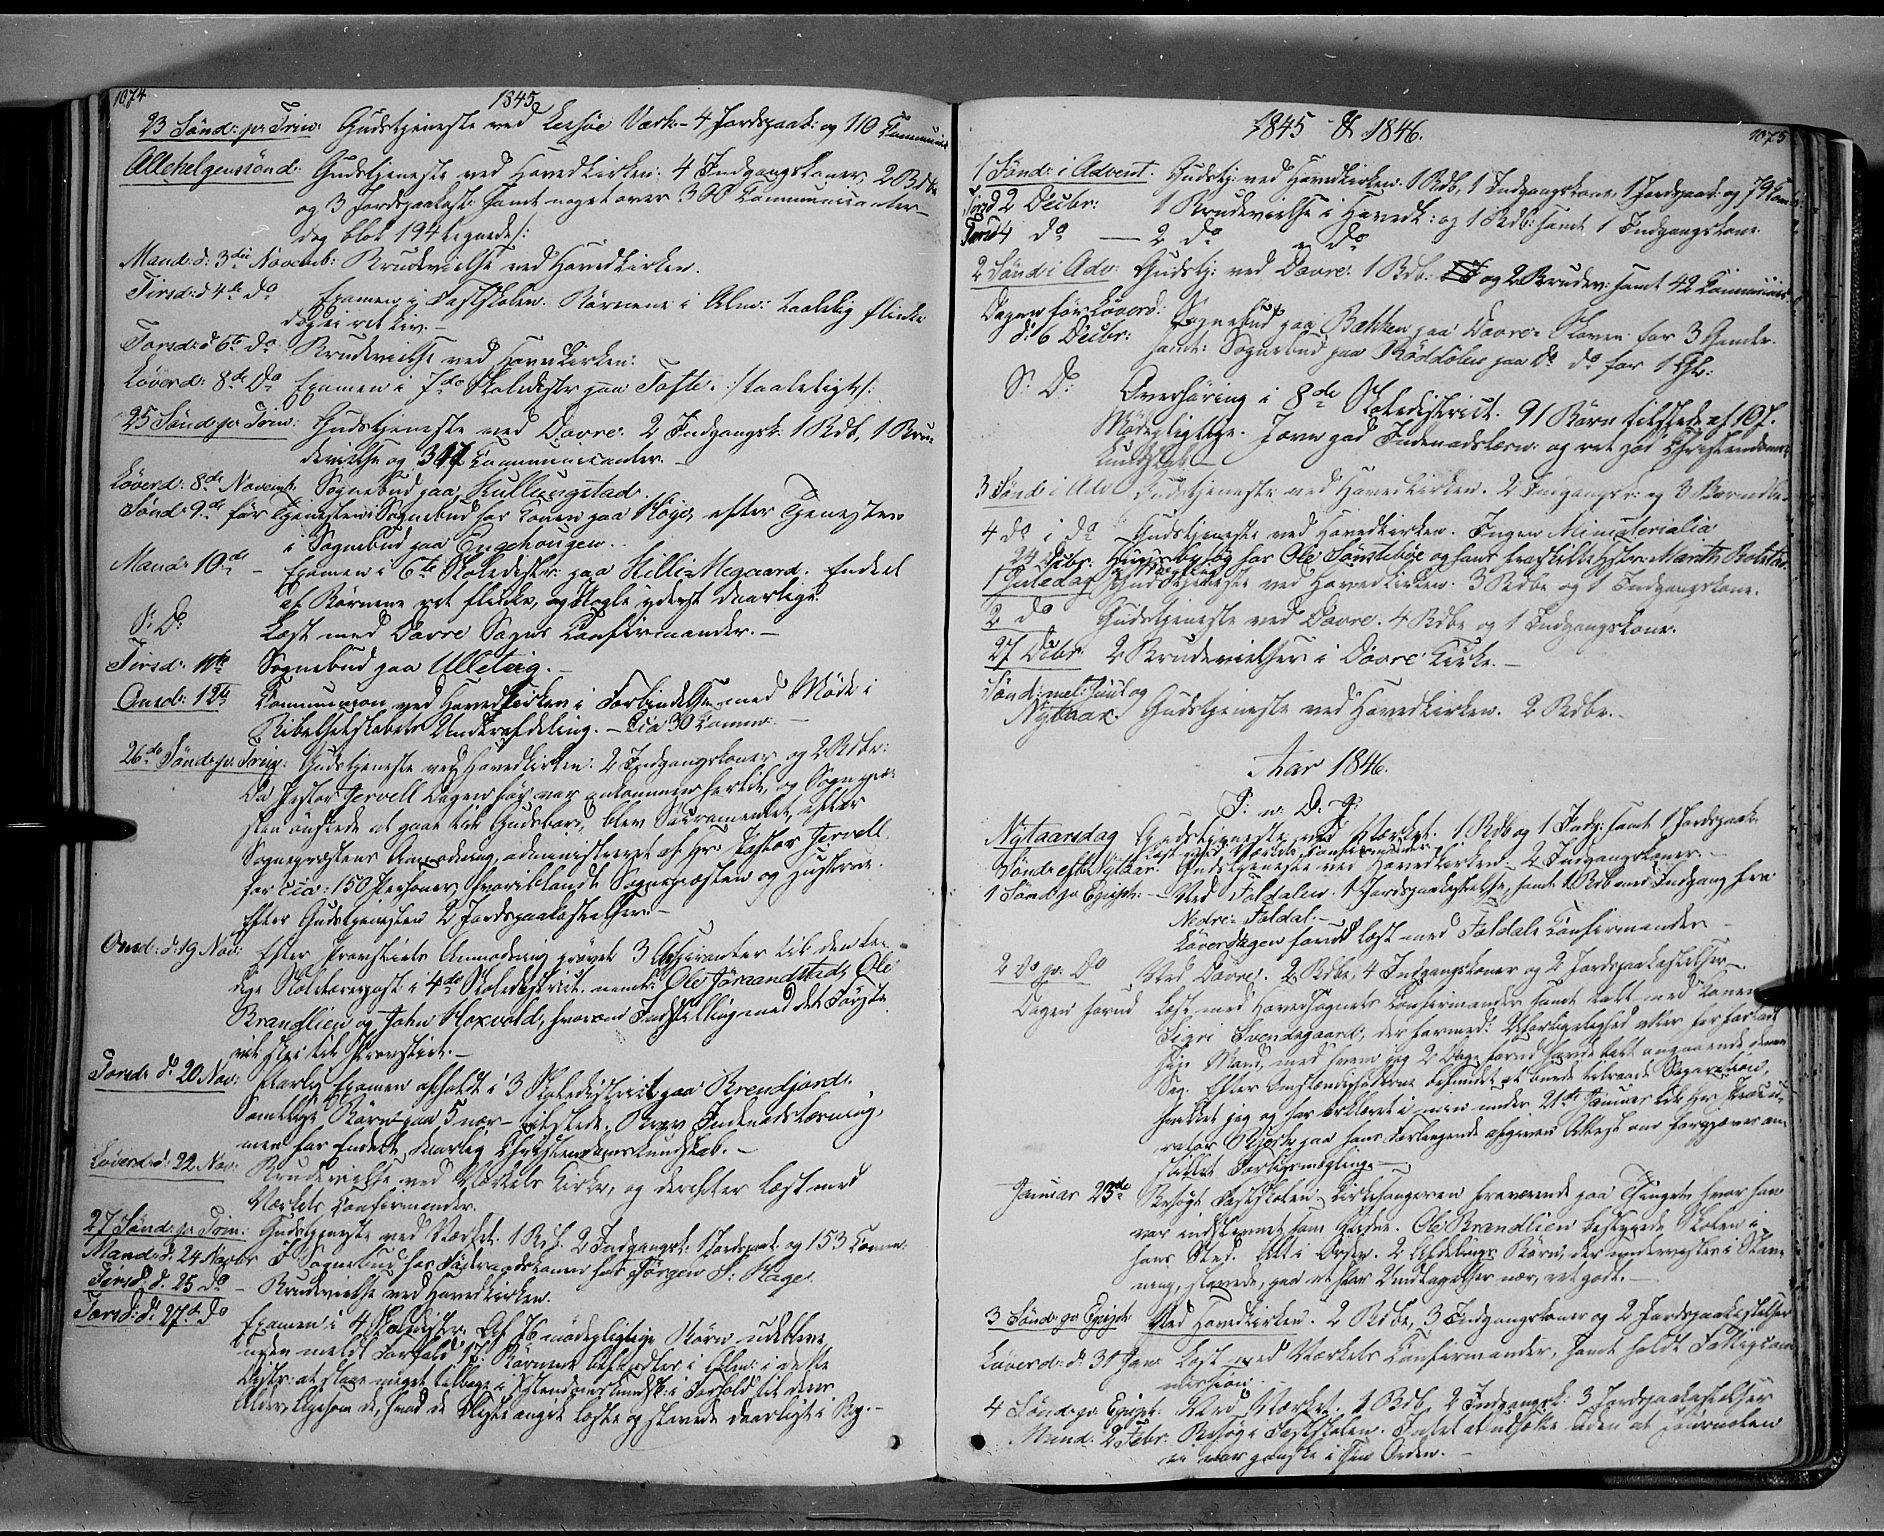 SAH, Lesja prestekontor, Ministerialbok nr. 6B, 1843-1854, s. 1074-1075